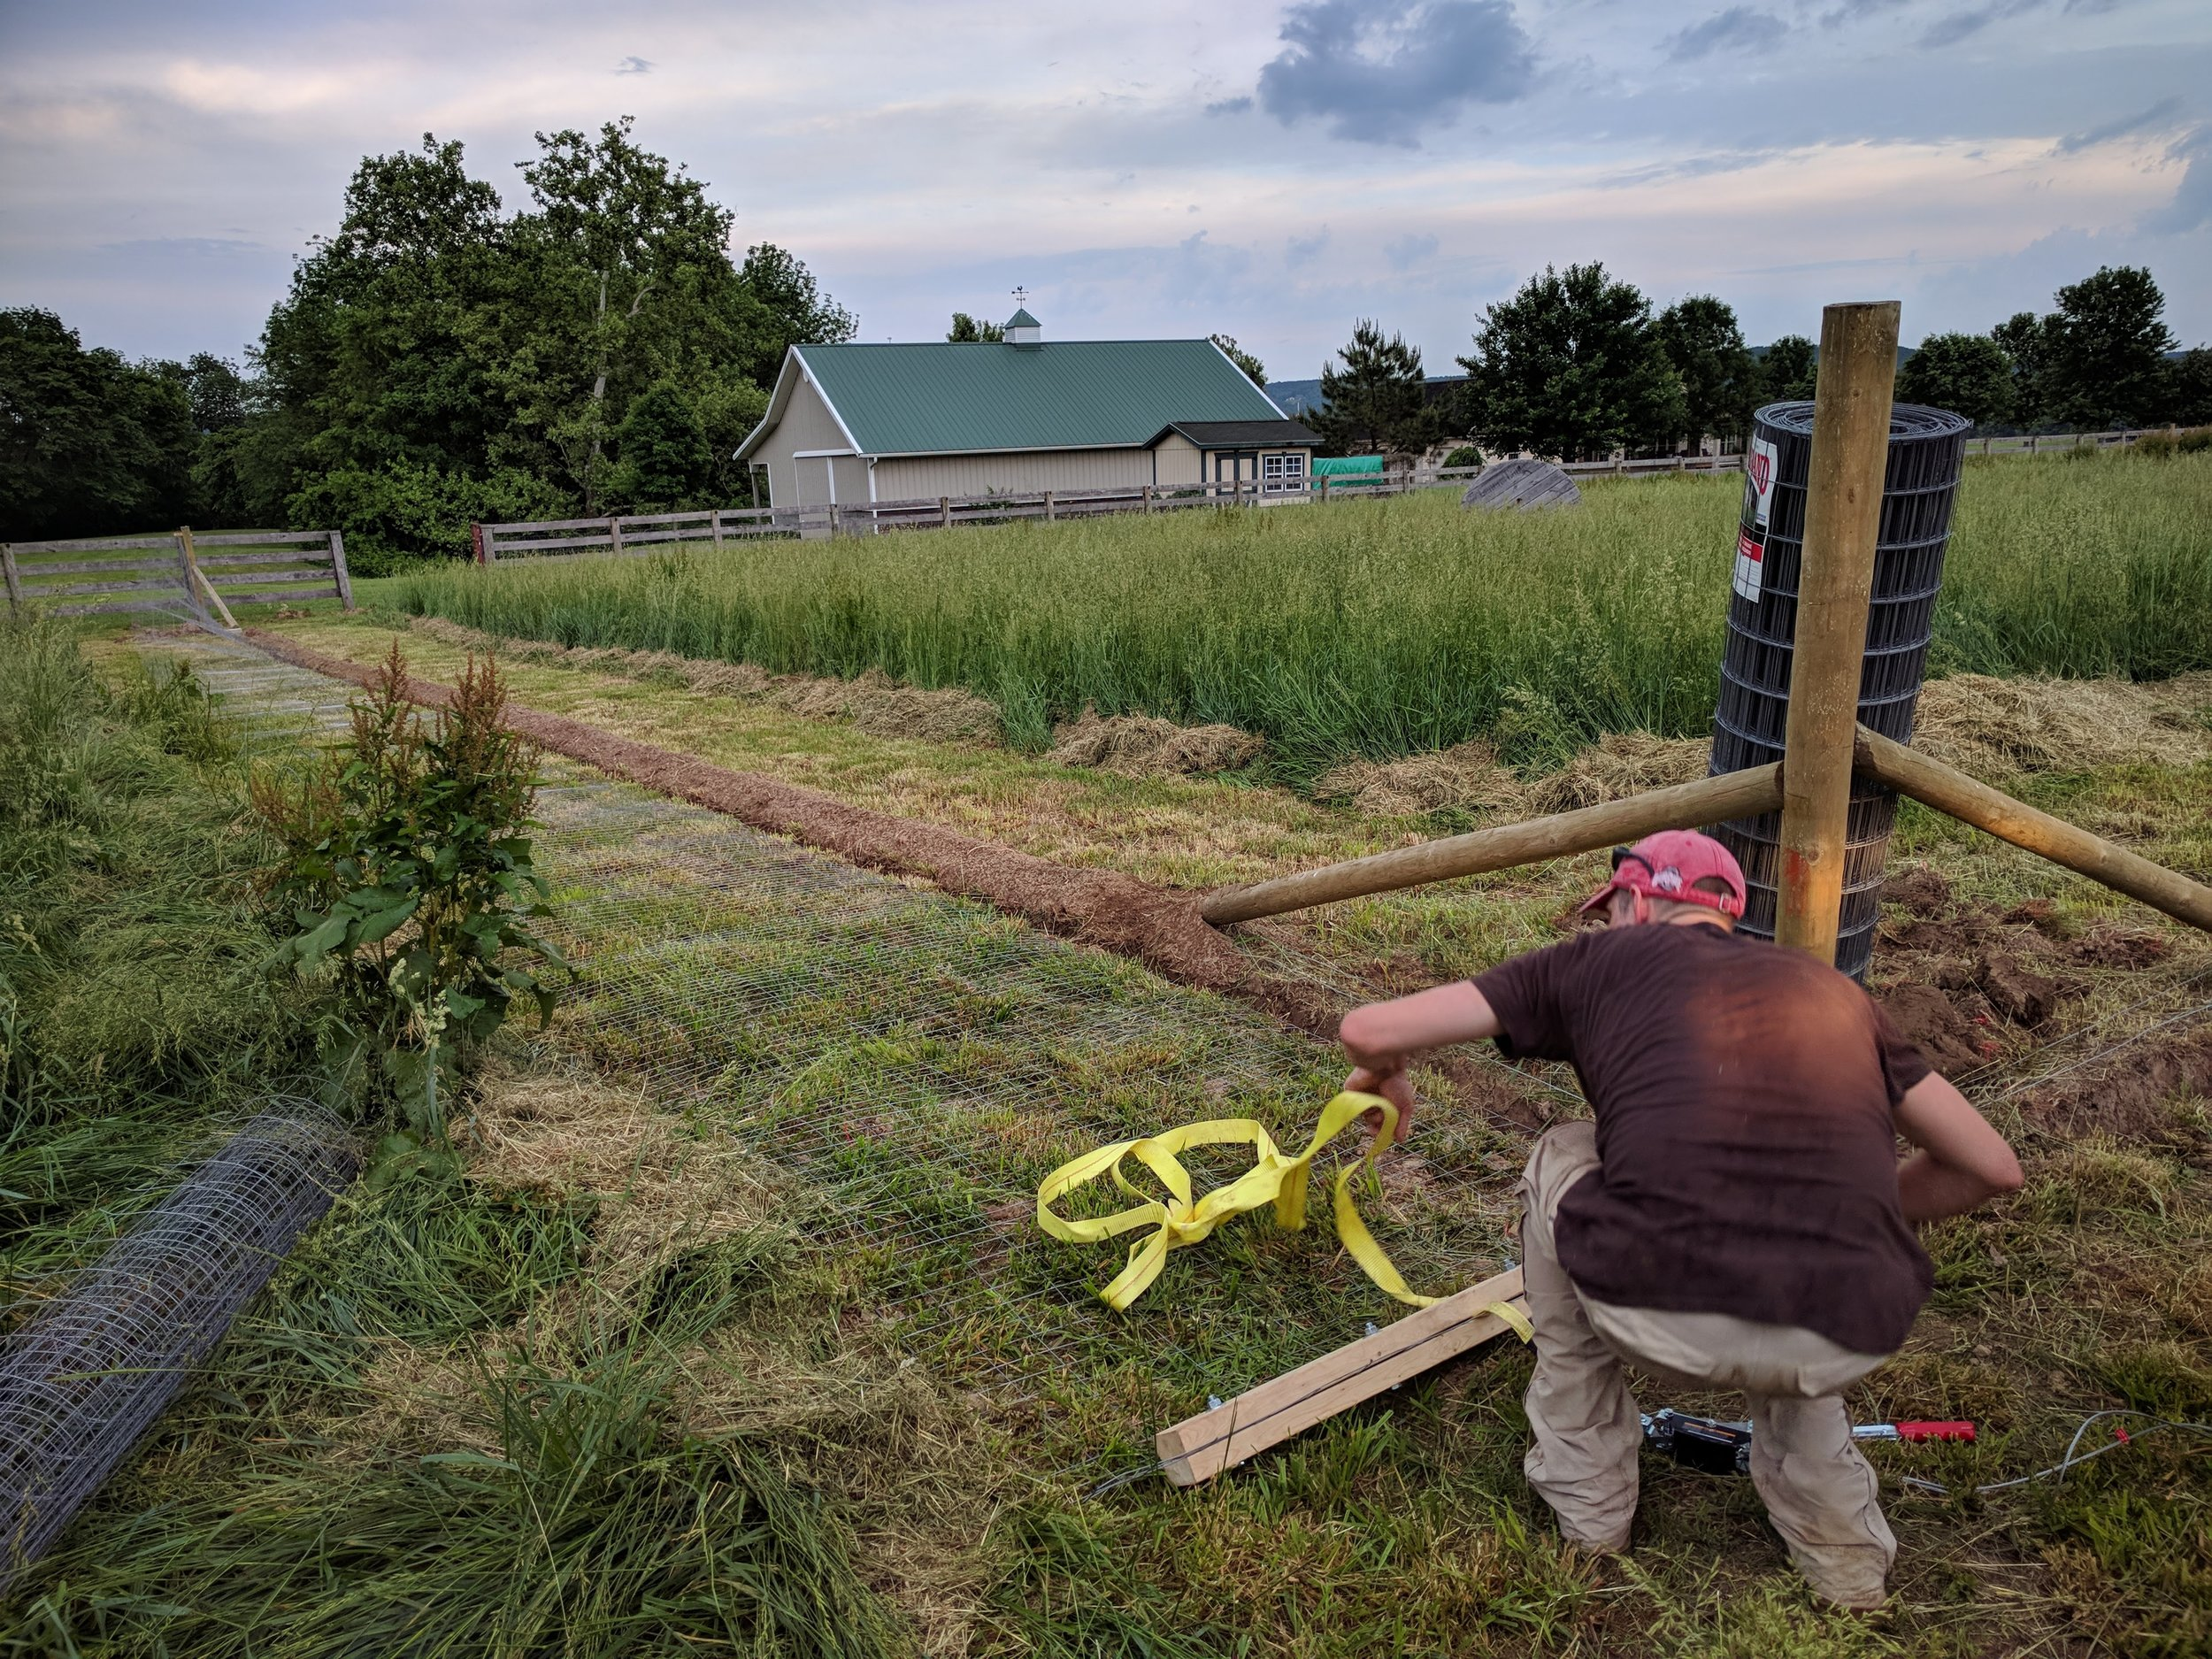 Jared fashioned a fence stretcher!